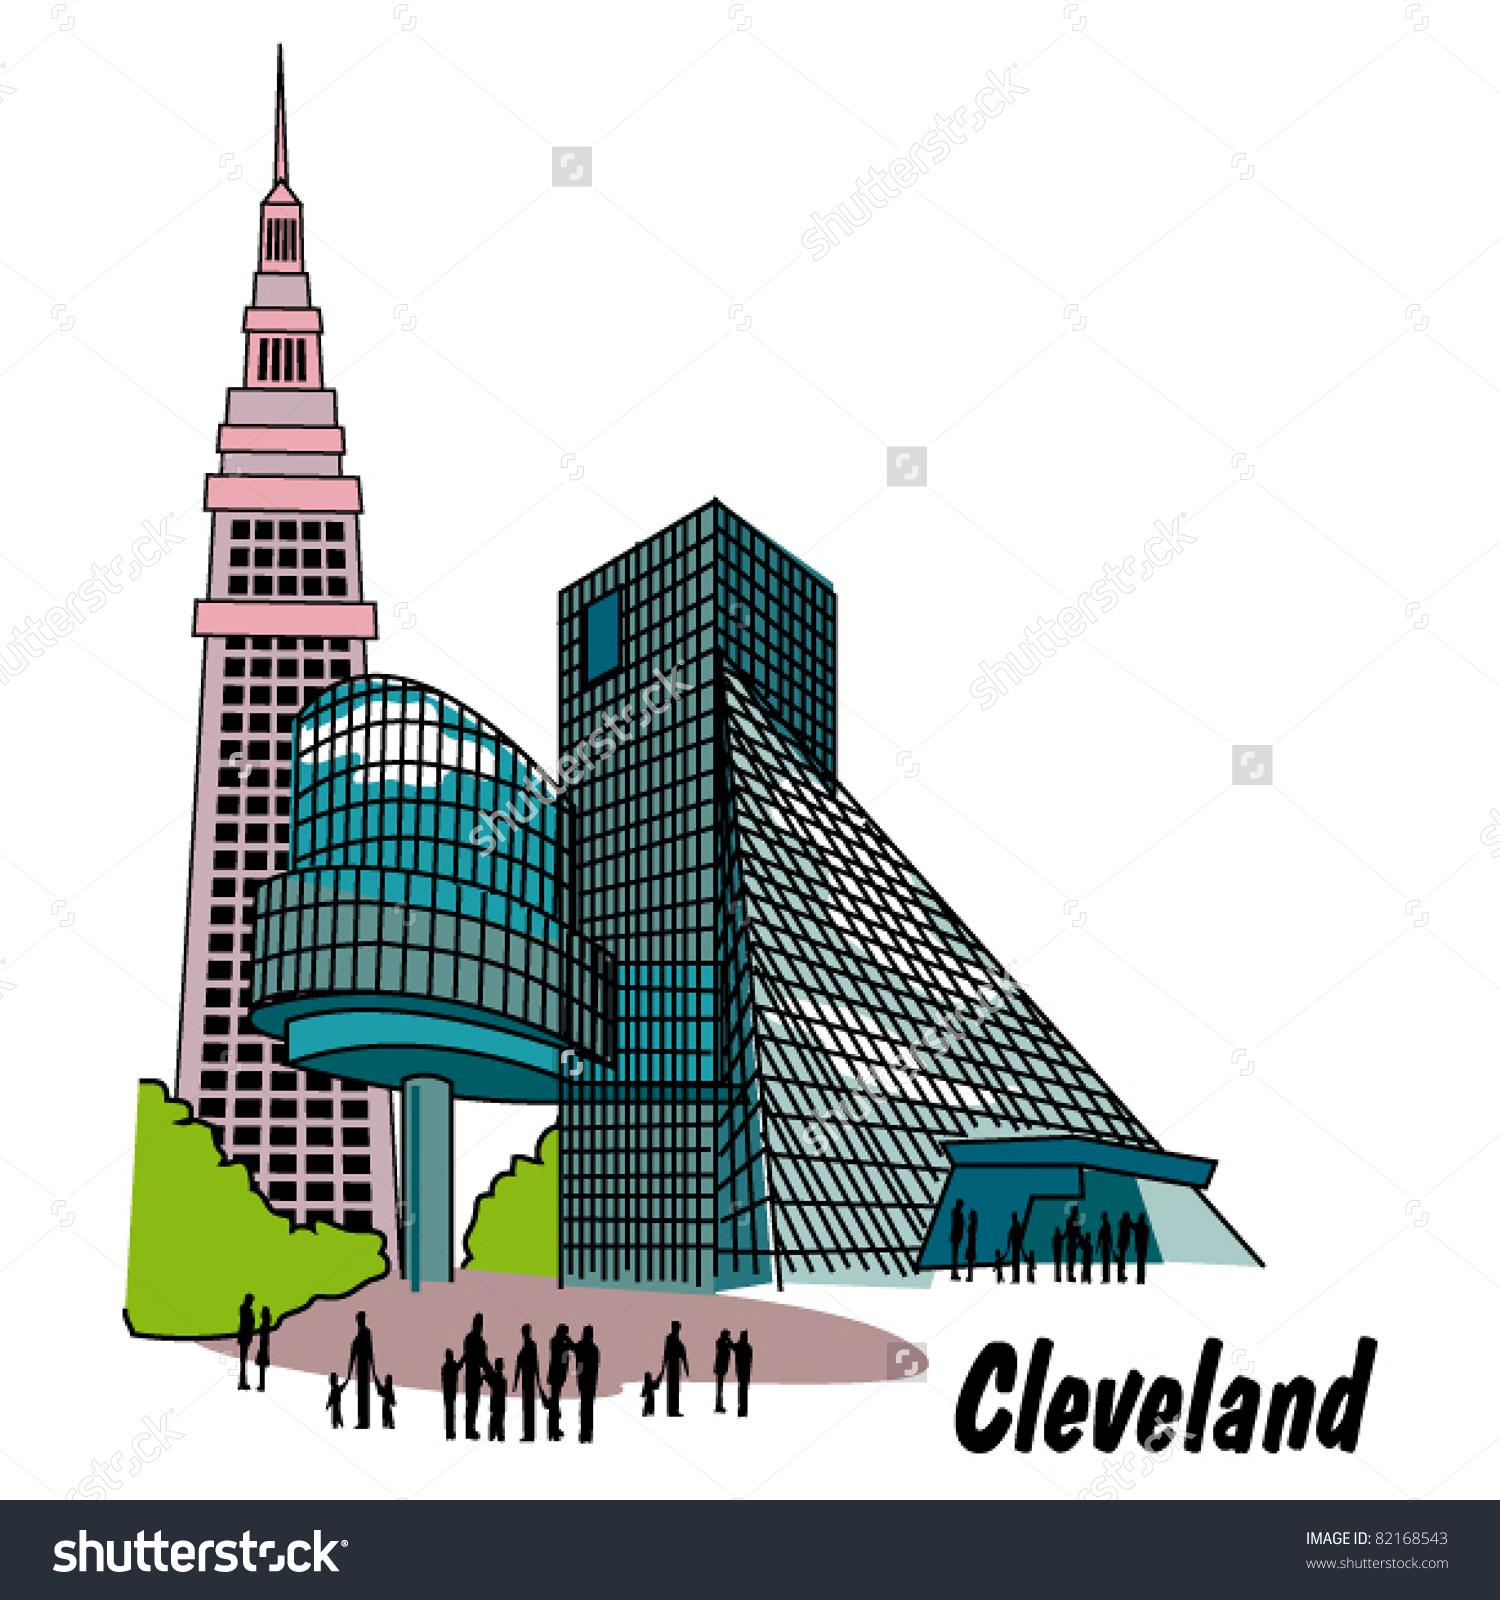 Cleveland Ohio Clip Art Stock Vector 82168543.